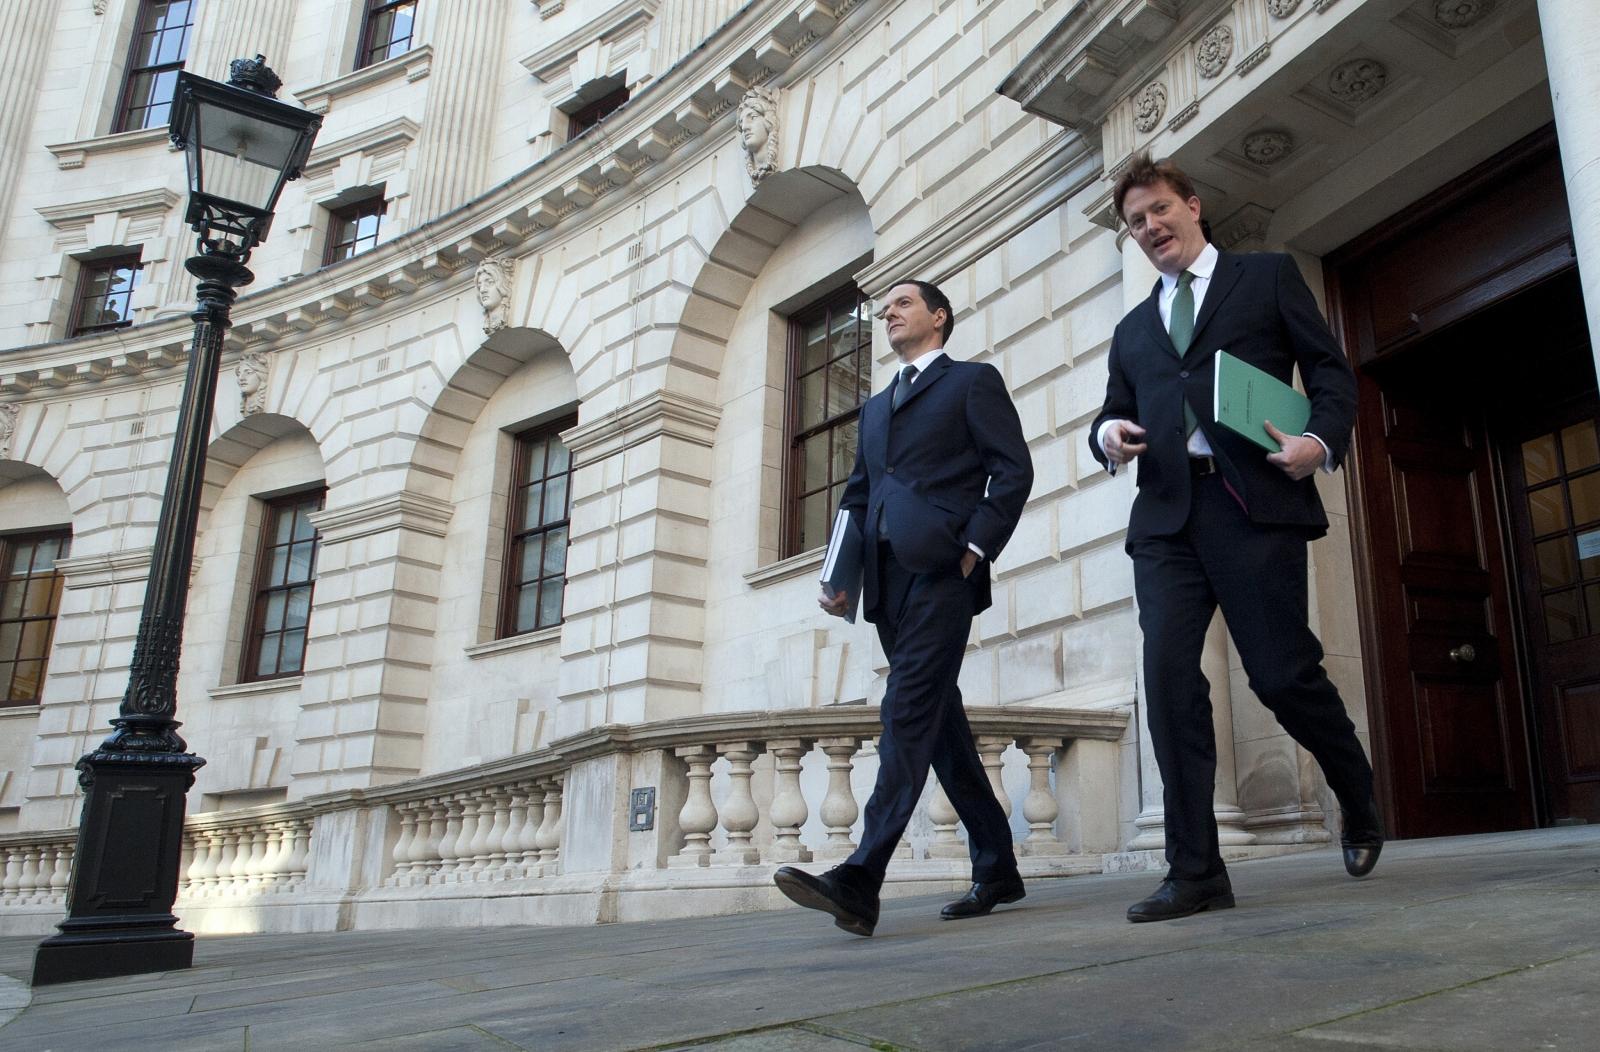 George Osborne and Danny Alexander